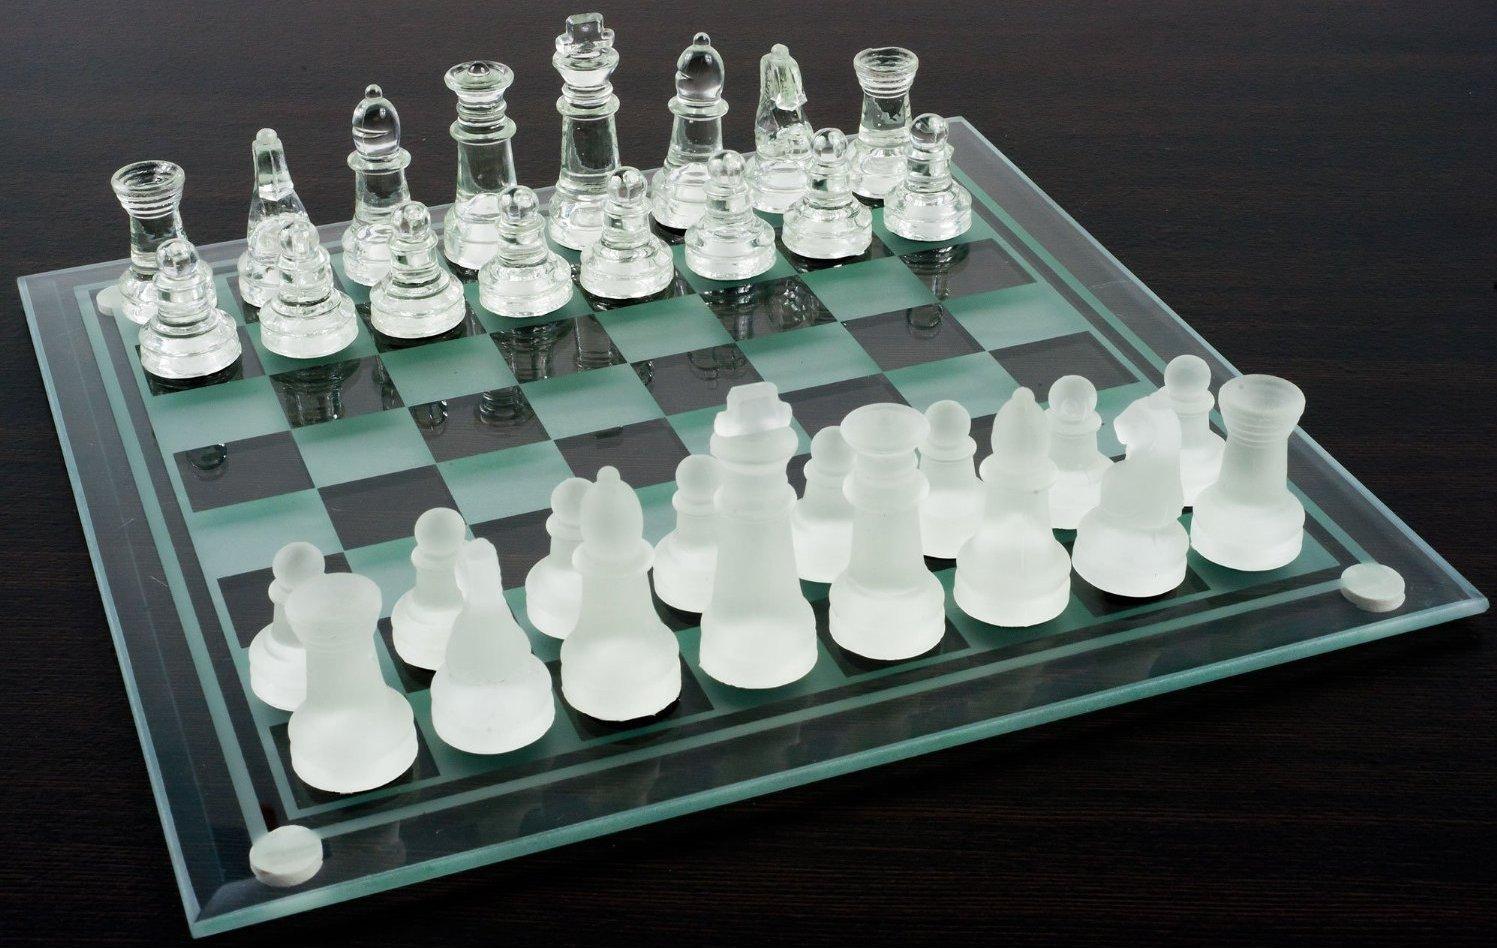 Glass Chess And Checker Board Set1